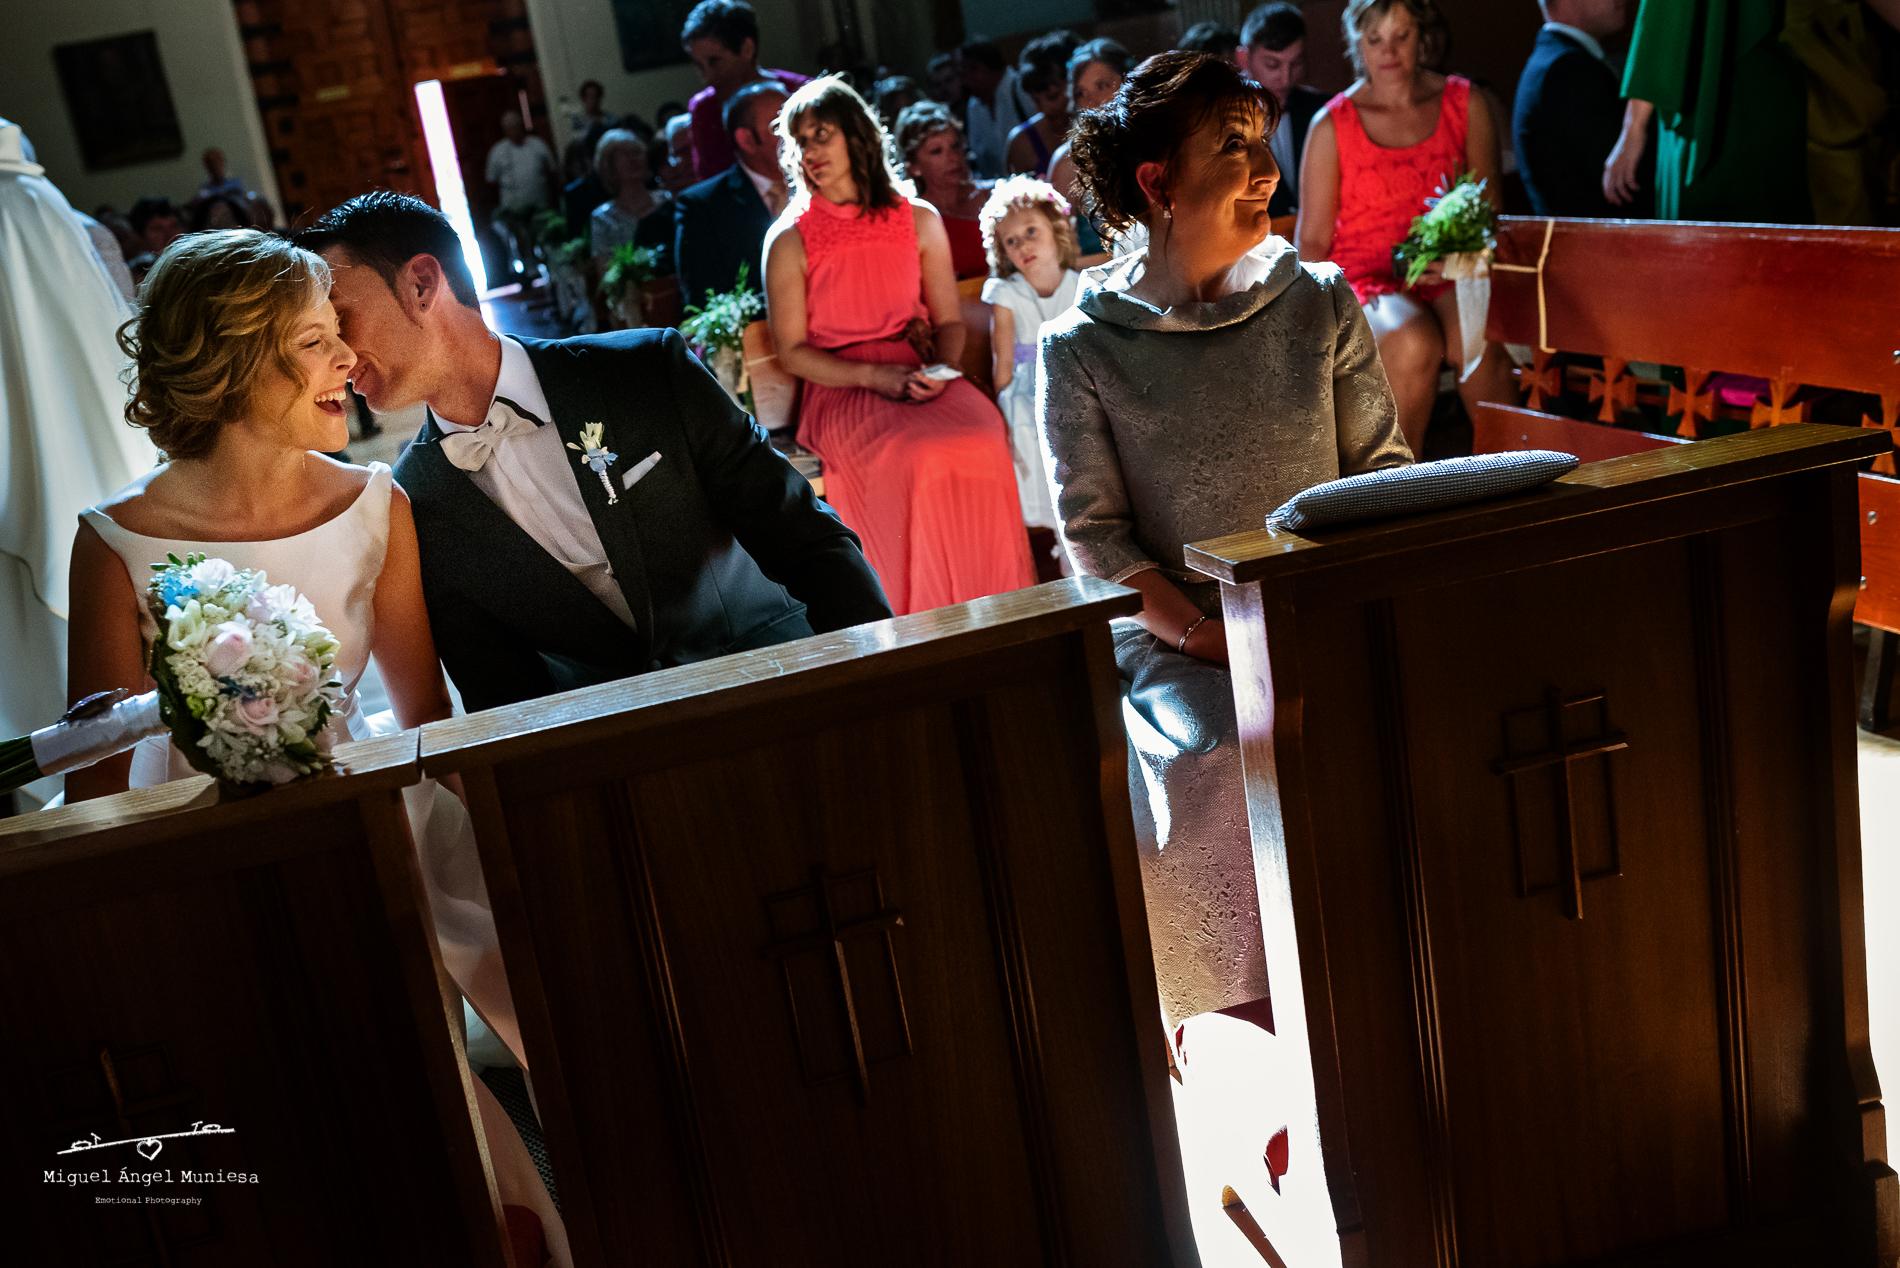 boda, fotografia de boda, boda zaragoza, fotografia, wedding, wedding photography, miguel angel muniesa, fotografo boda Zaragoza, fotografo boda, destination wedding_ 027